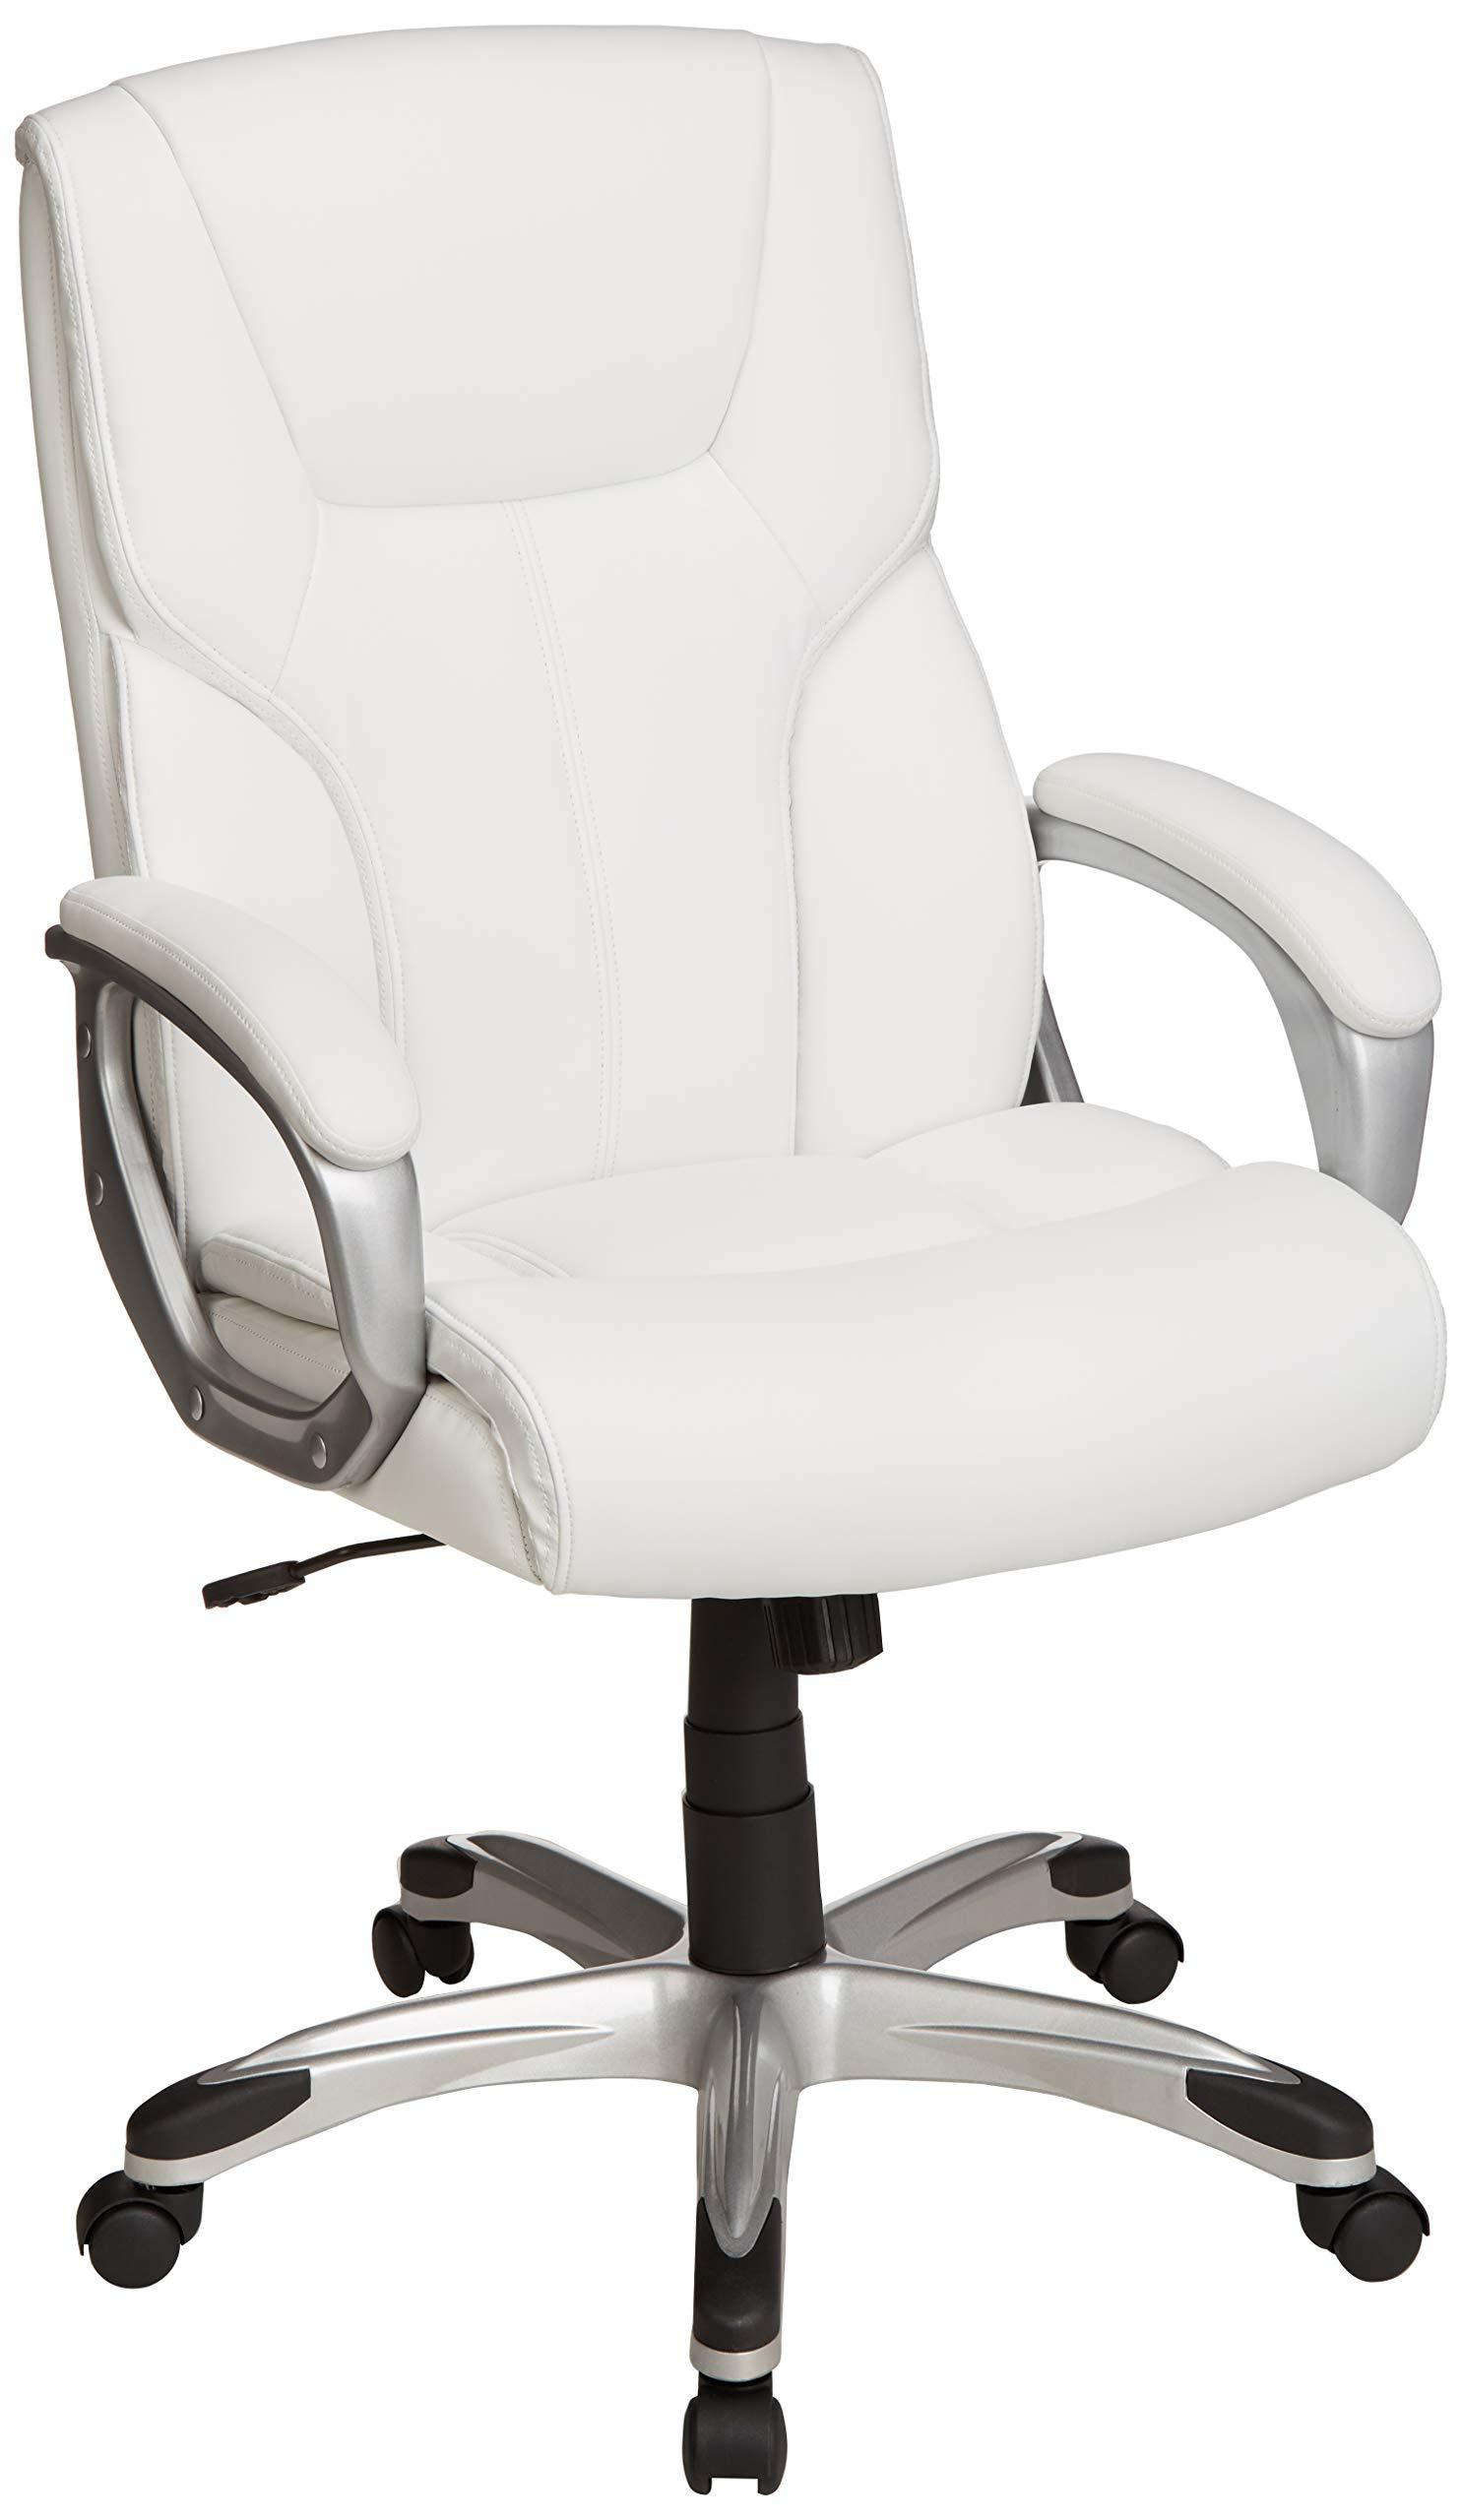 AmazonBasics High-Back Executive Swivel Office Desk Chair - White with Pewter Finish by AmazonBasics